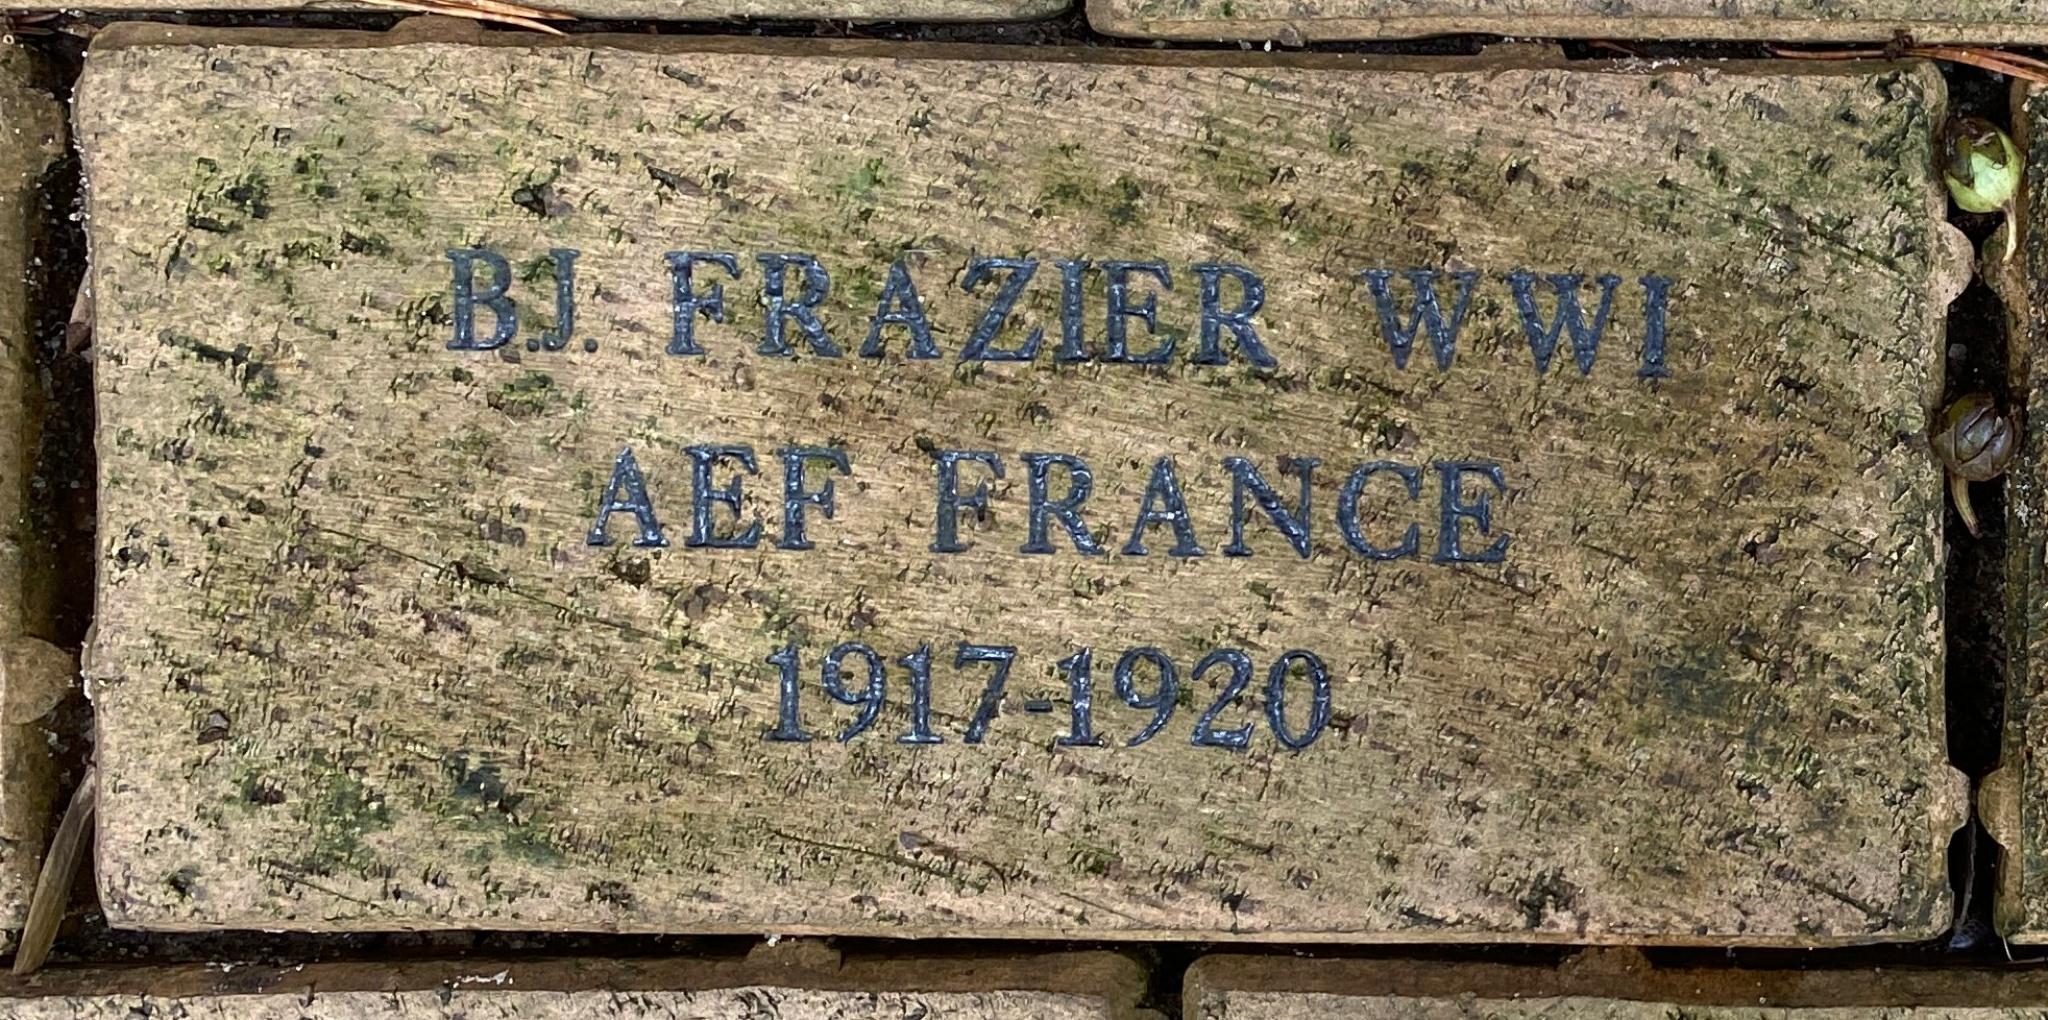 B.J. FRAZIER WWI A E F FRANCE 1917-1920